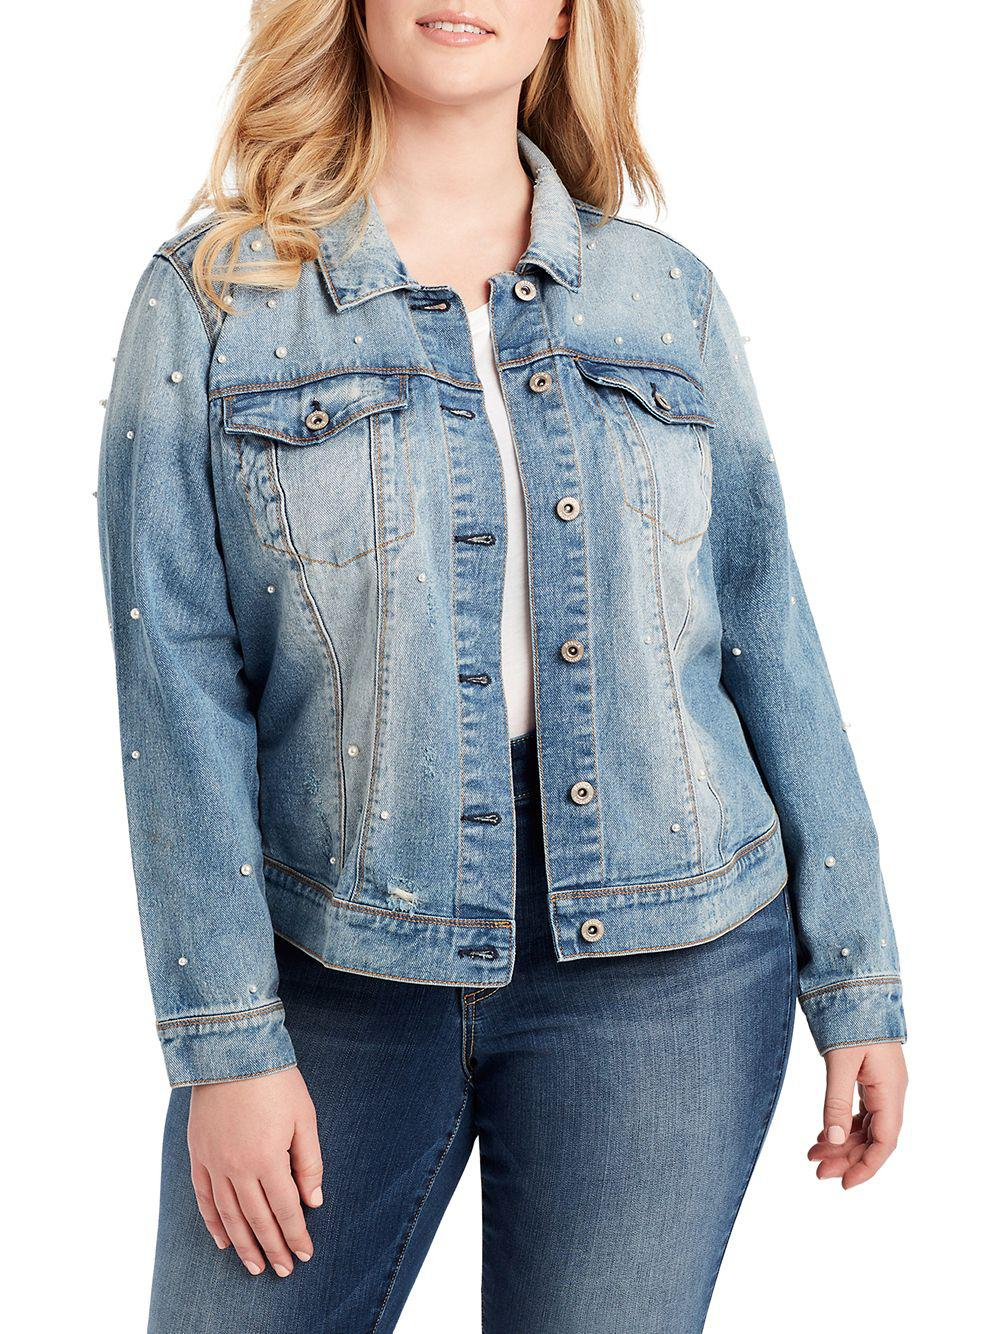 c05136c9fba Lyst - Jessica Simpson Plus Embellished Denim Jacket in Blue - Save ...